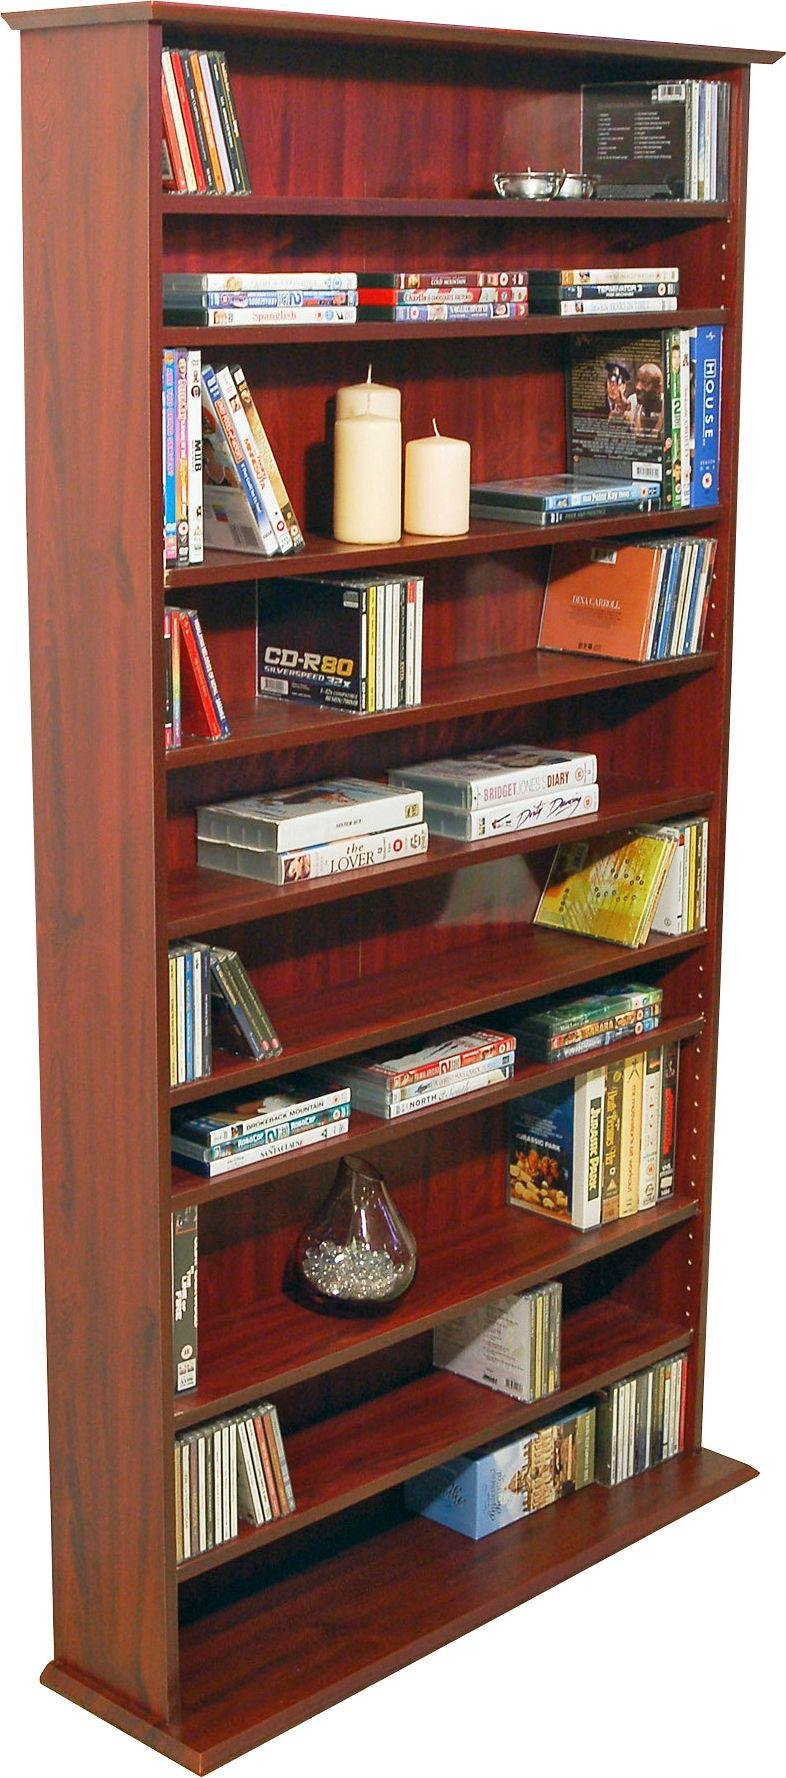 Harrogate Mahogany CD, DVD and Blu-ray Shelving Cabinet.